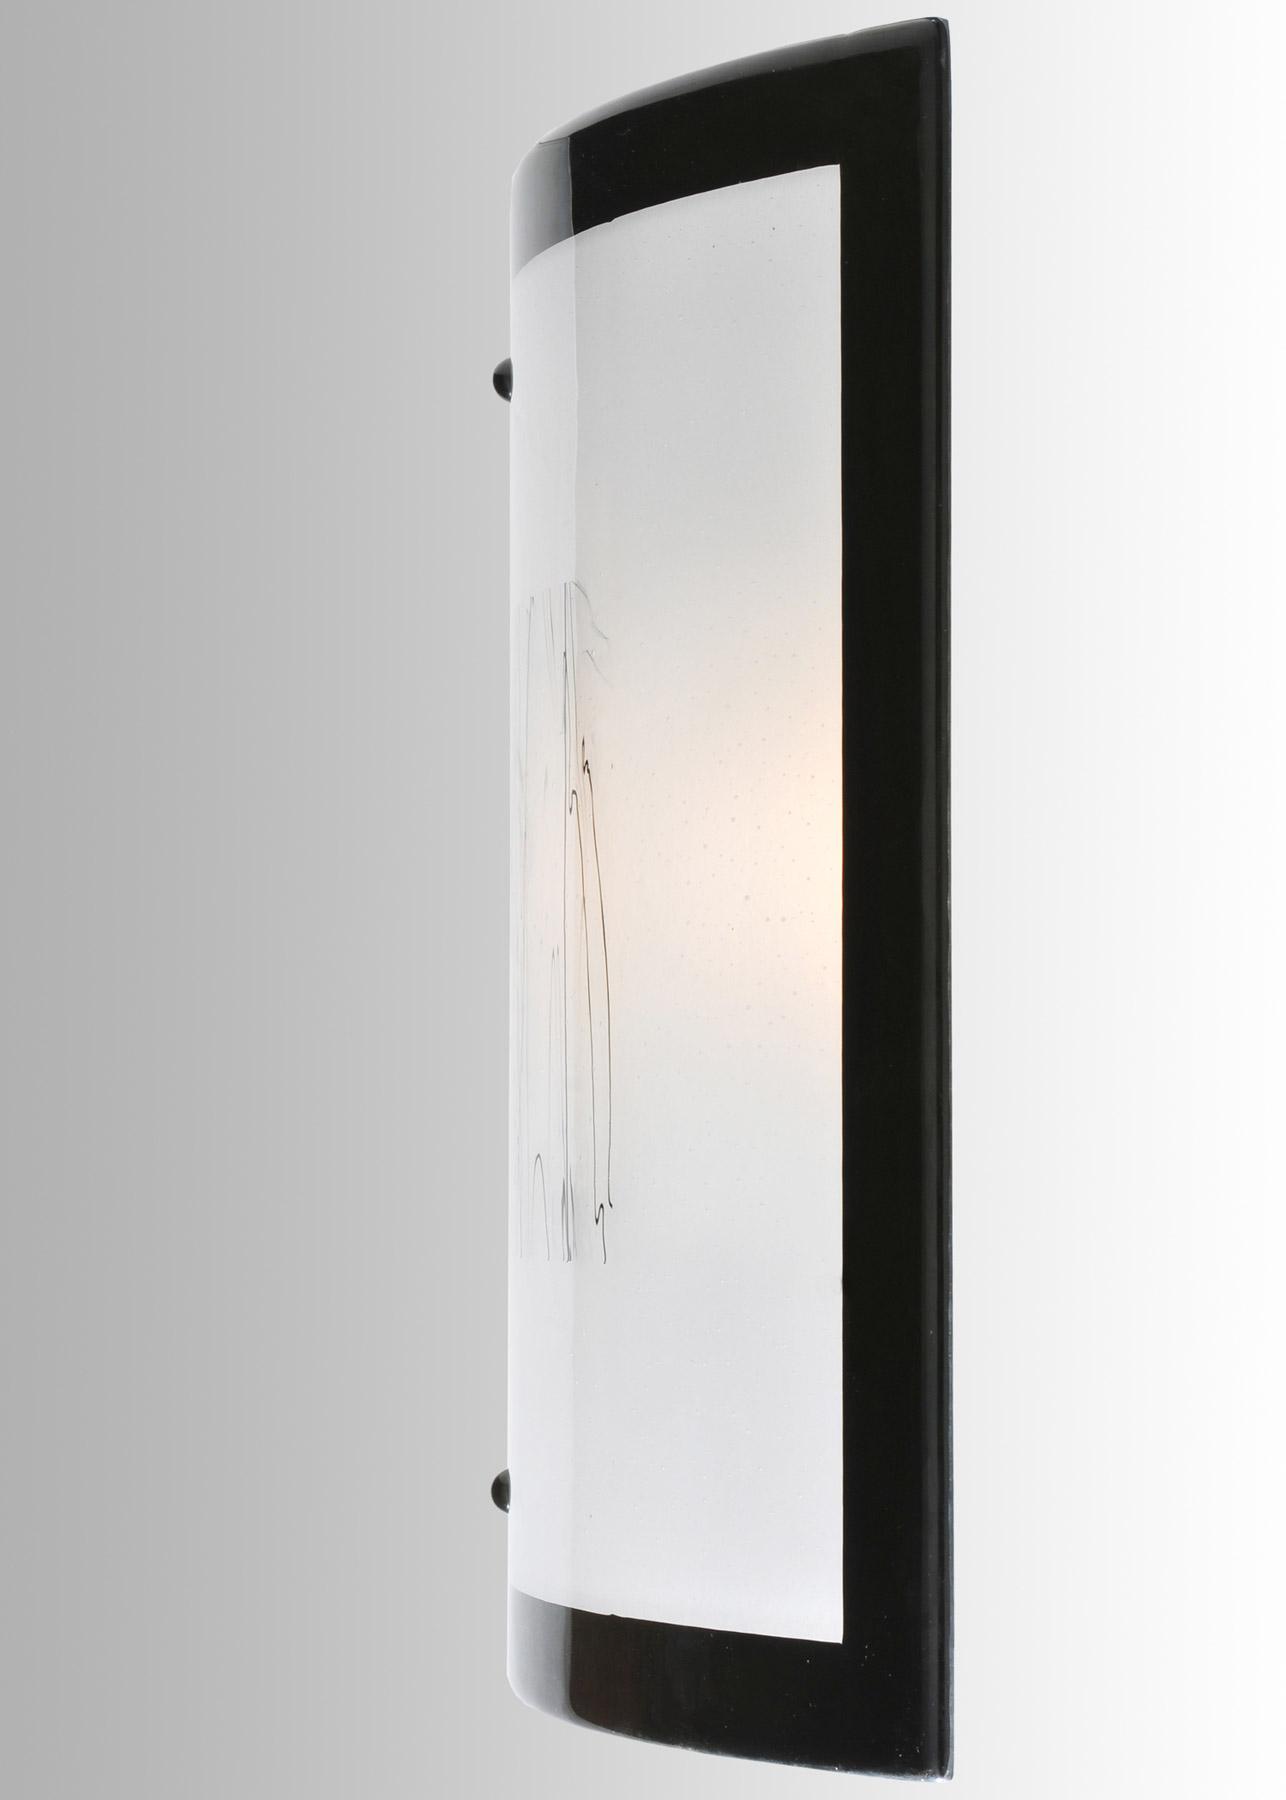 Meyda 116897 Twigs Fused Glass Wall Sconce